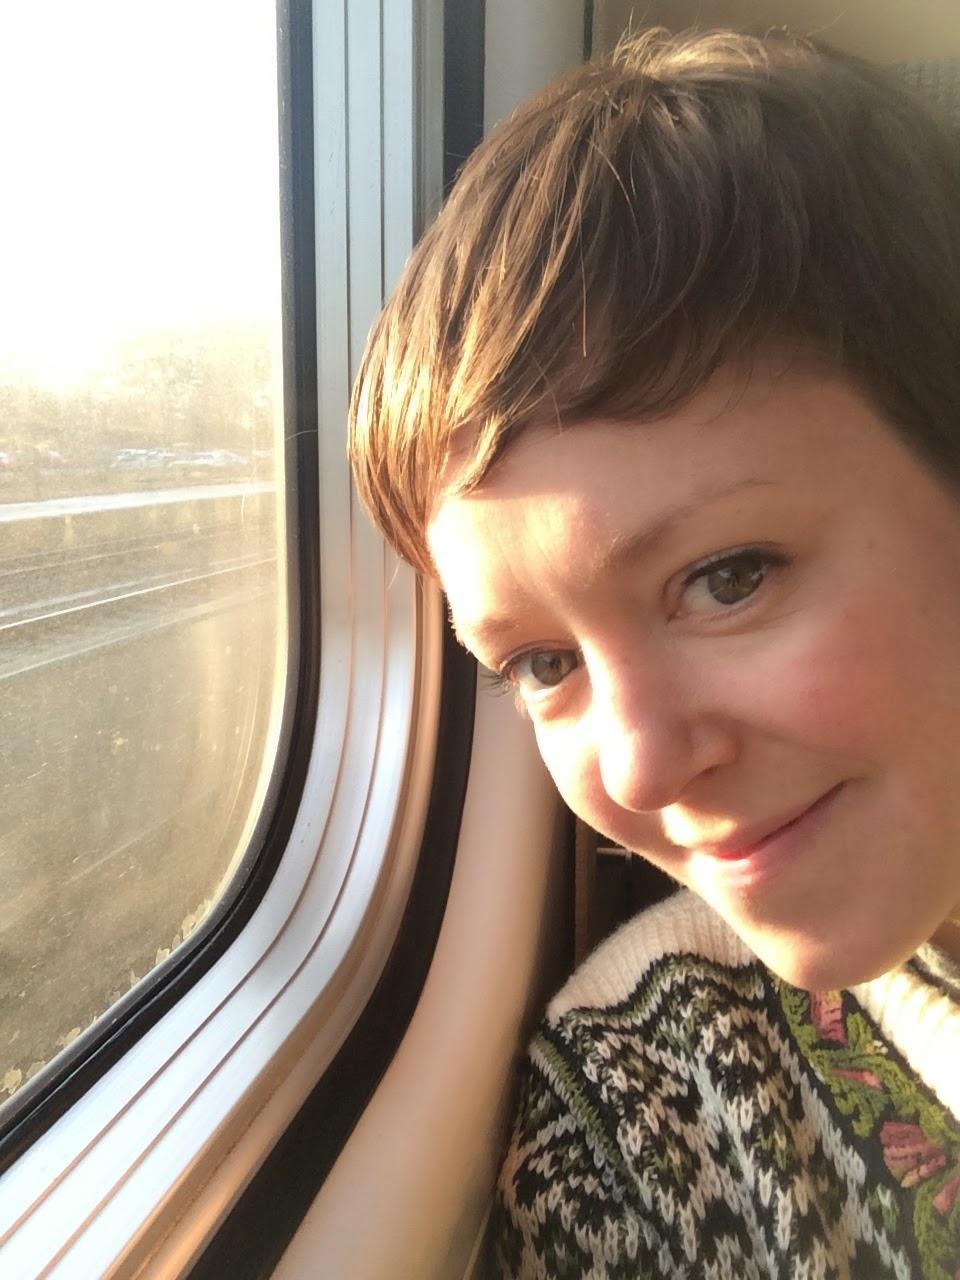 Emily Barker - I chopped all my hair off!